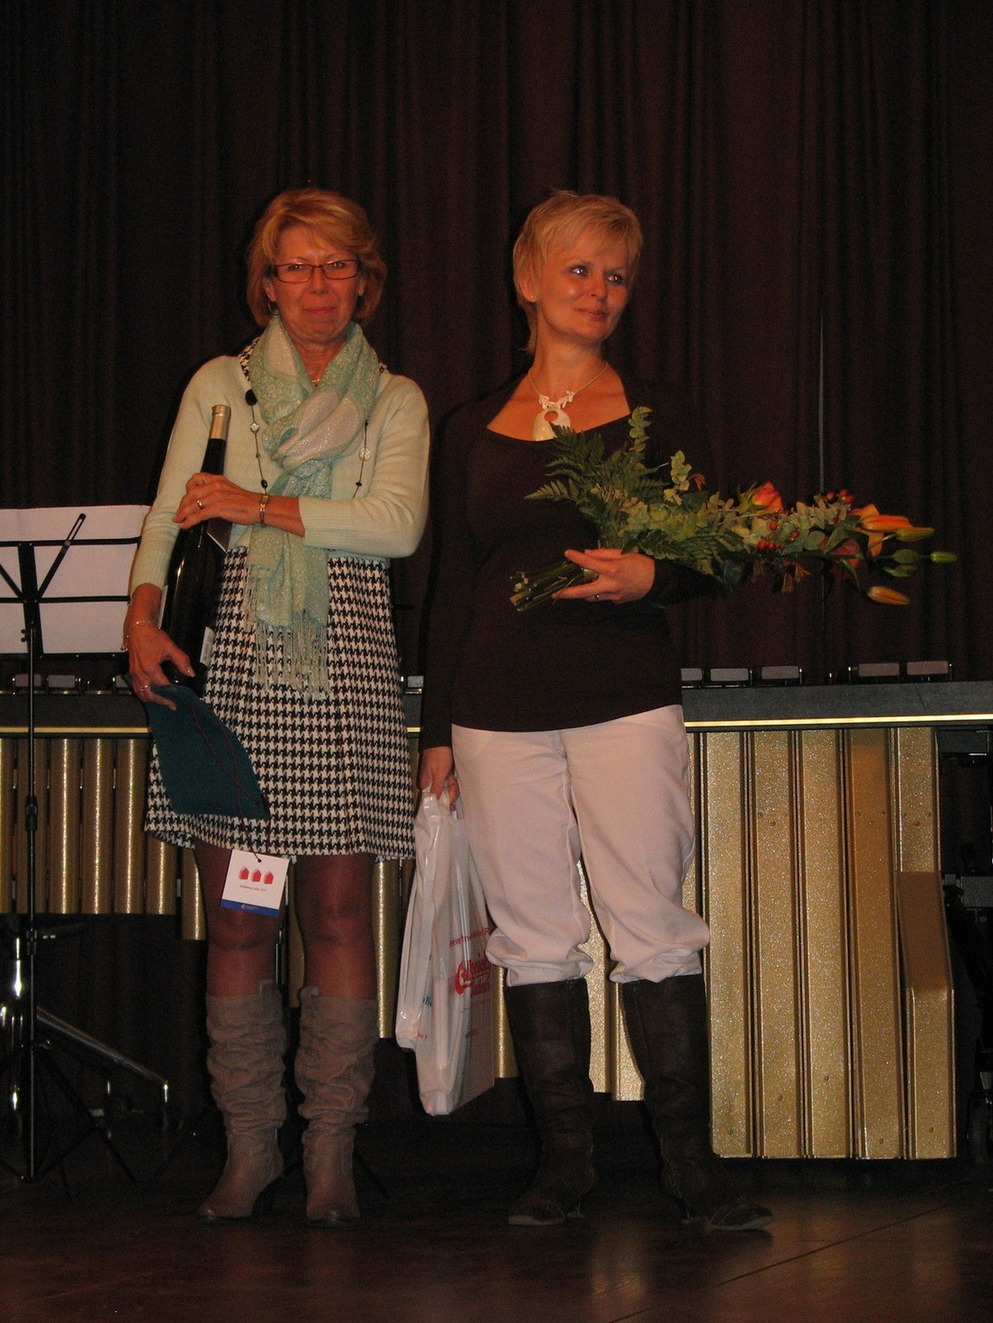 Diplom za významný počin získala Městská knihovna Vamberk